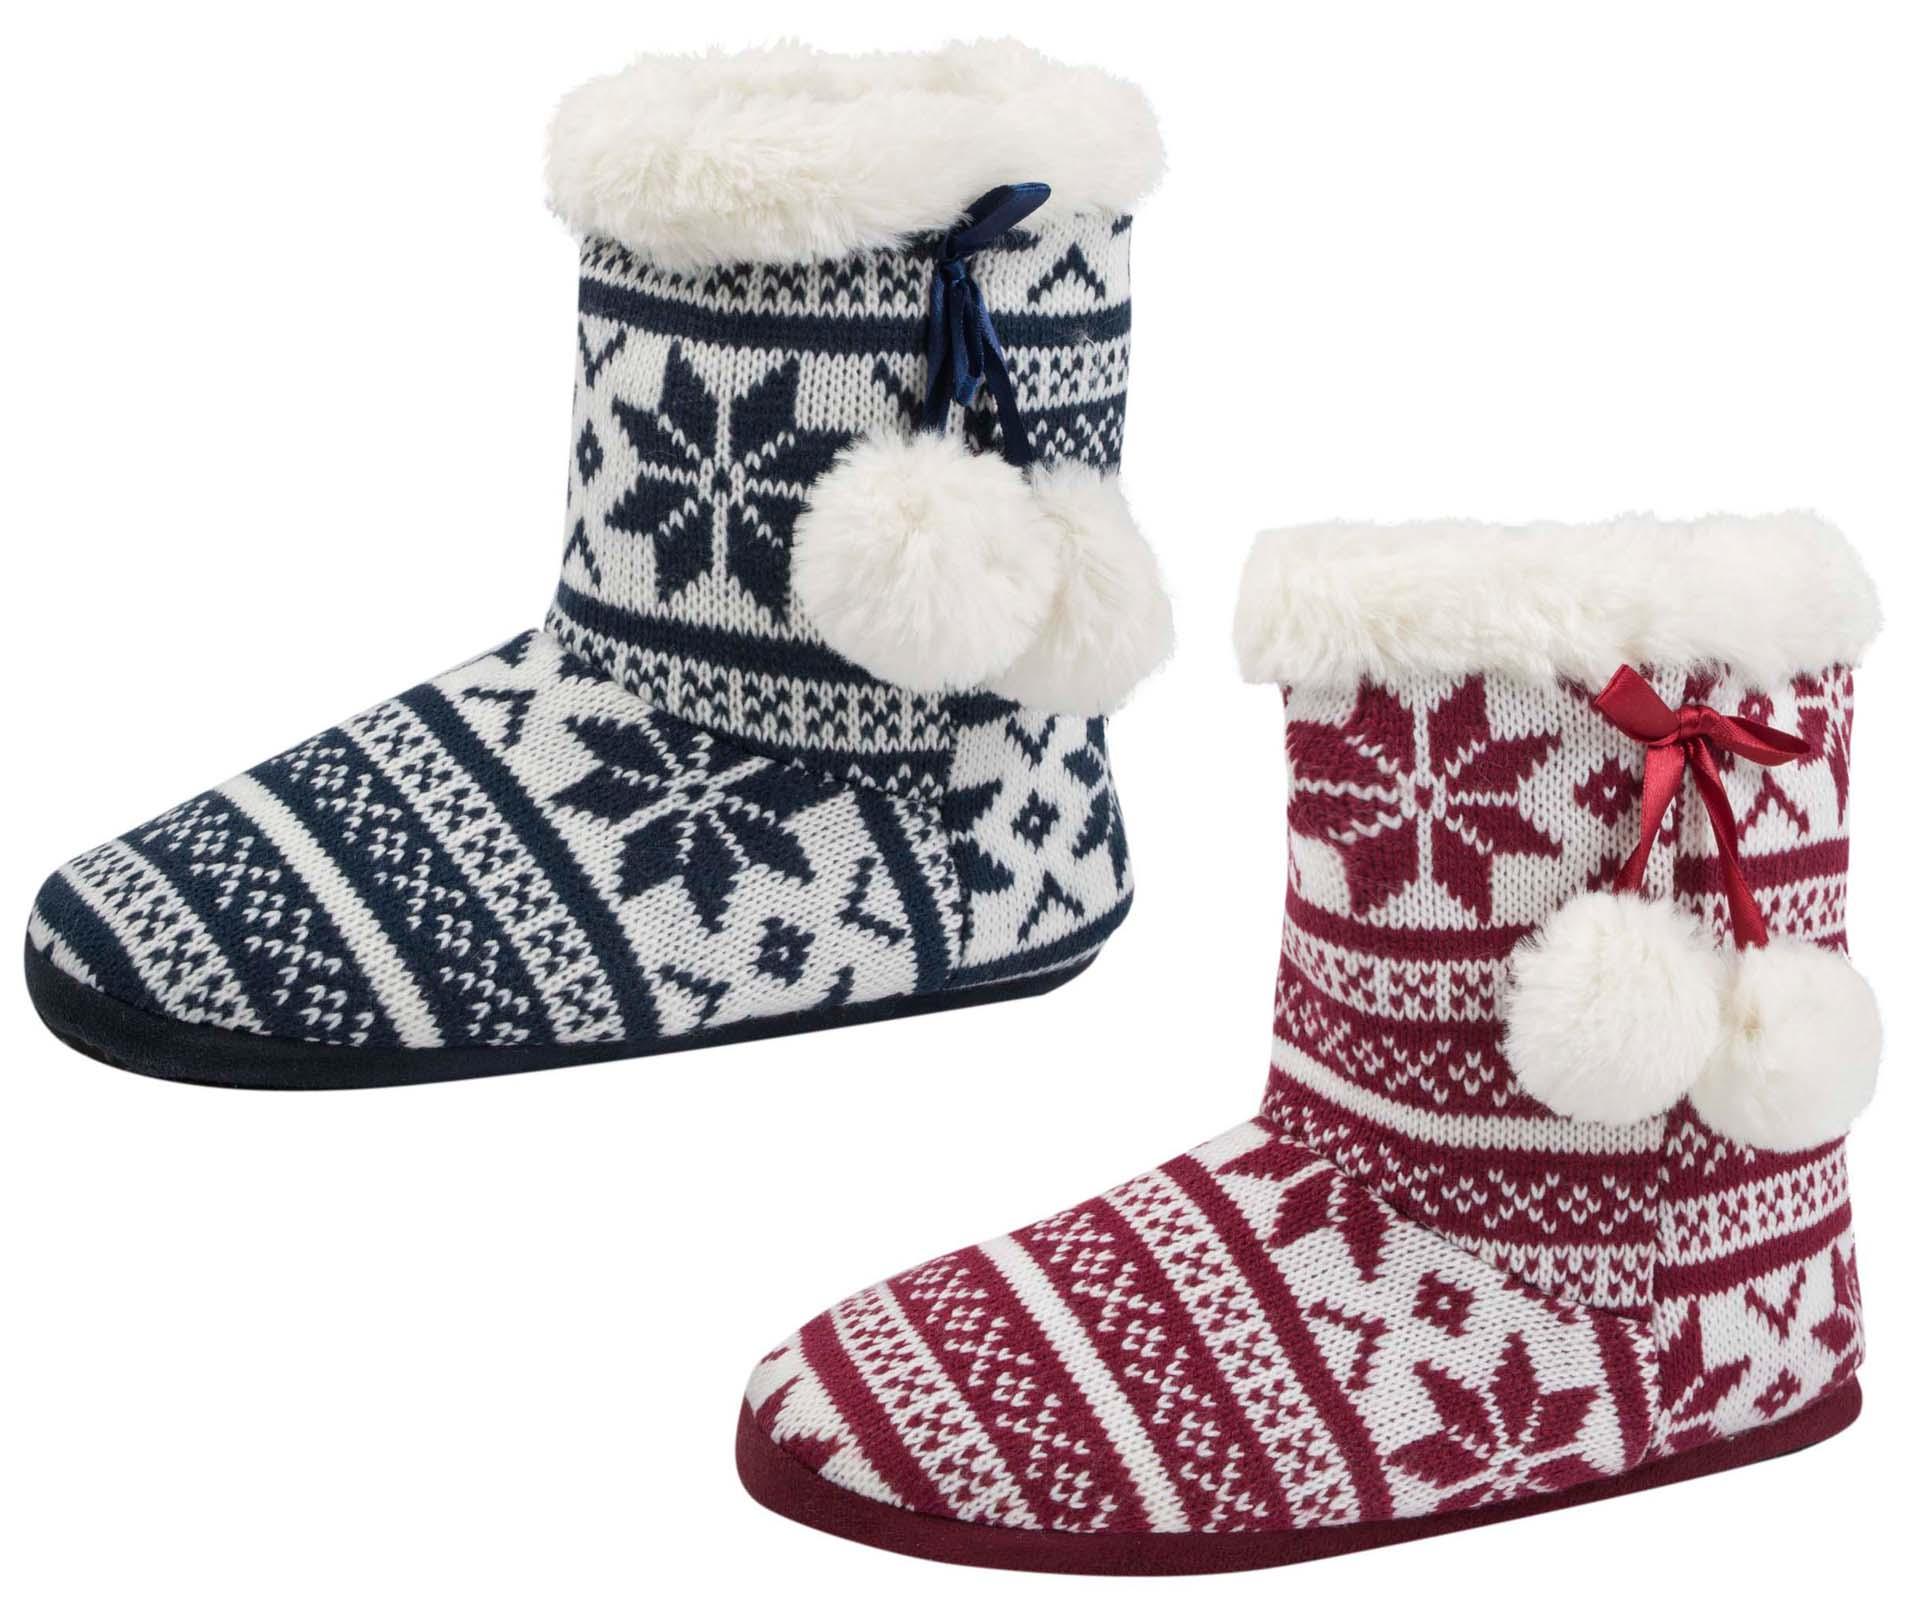 Womens Fairisle Slipper Boots Knitted